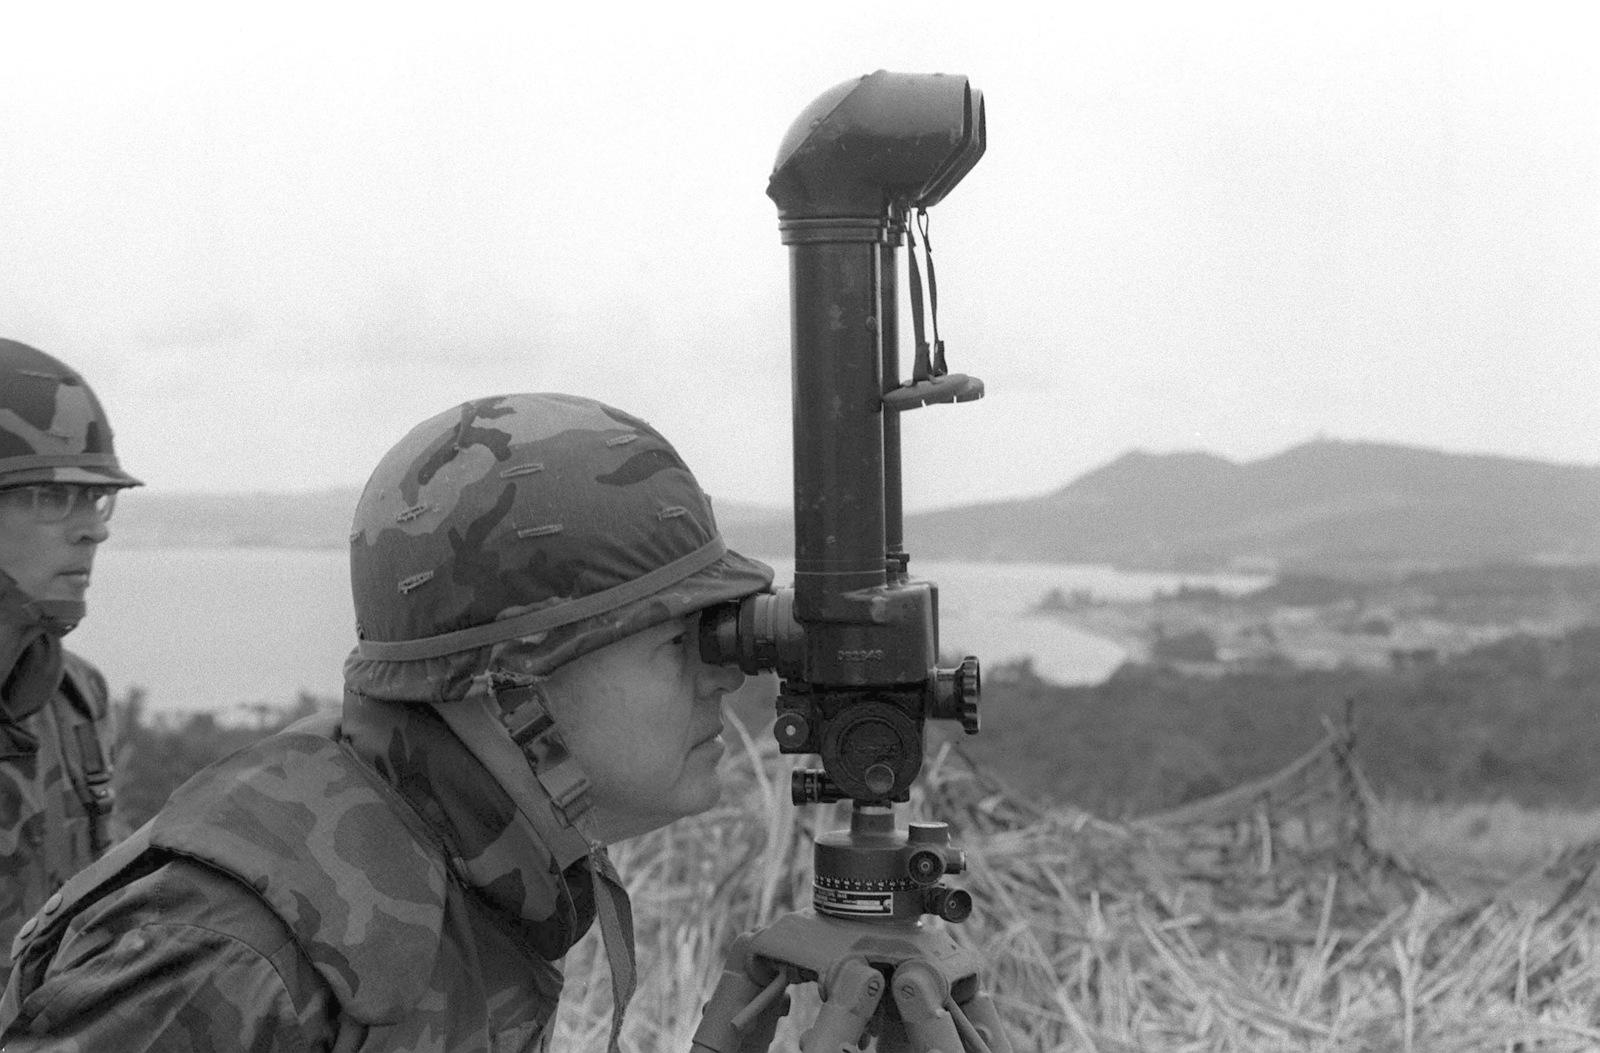 Lieutenant General D'Wayne Gray, cheif of staff, Headquarters Marine Corps, observes a live fire demonstration through an M-65 battery commander's telescope